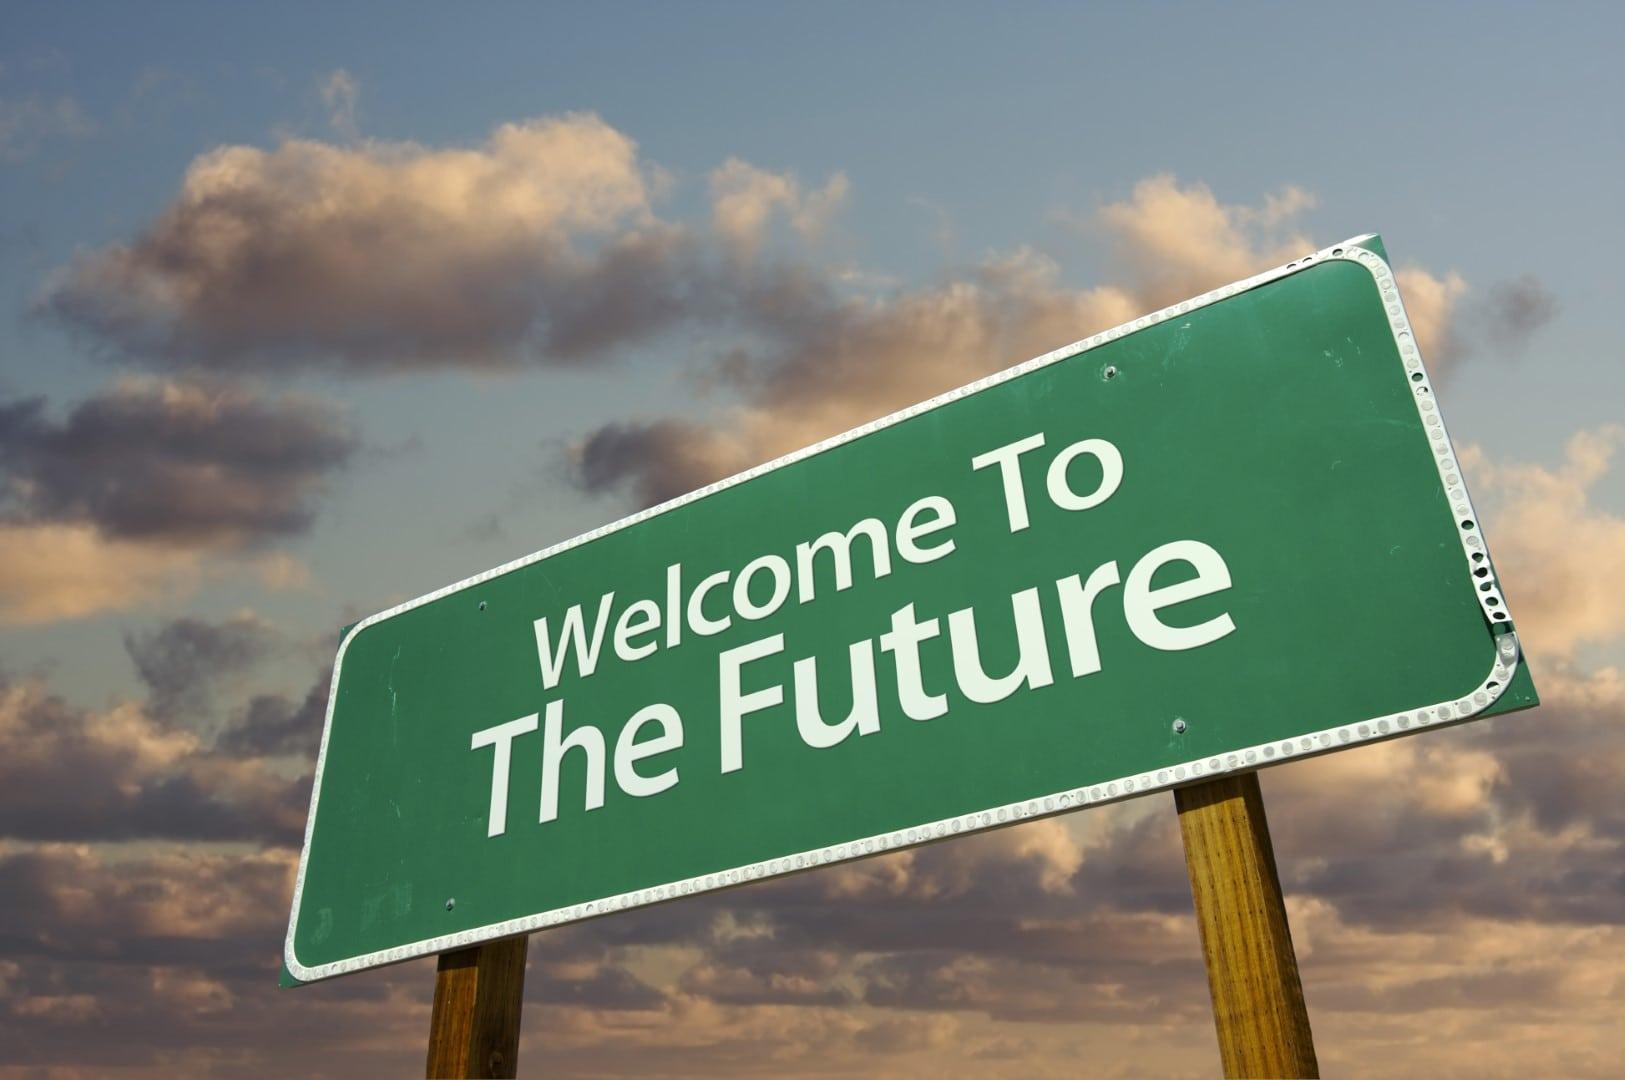 The-future-Large.jpeg